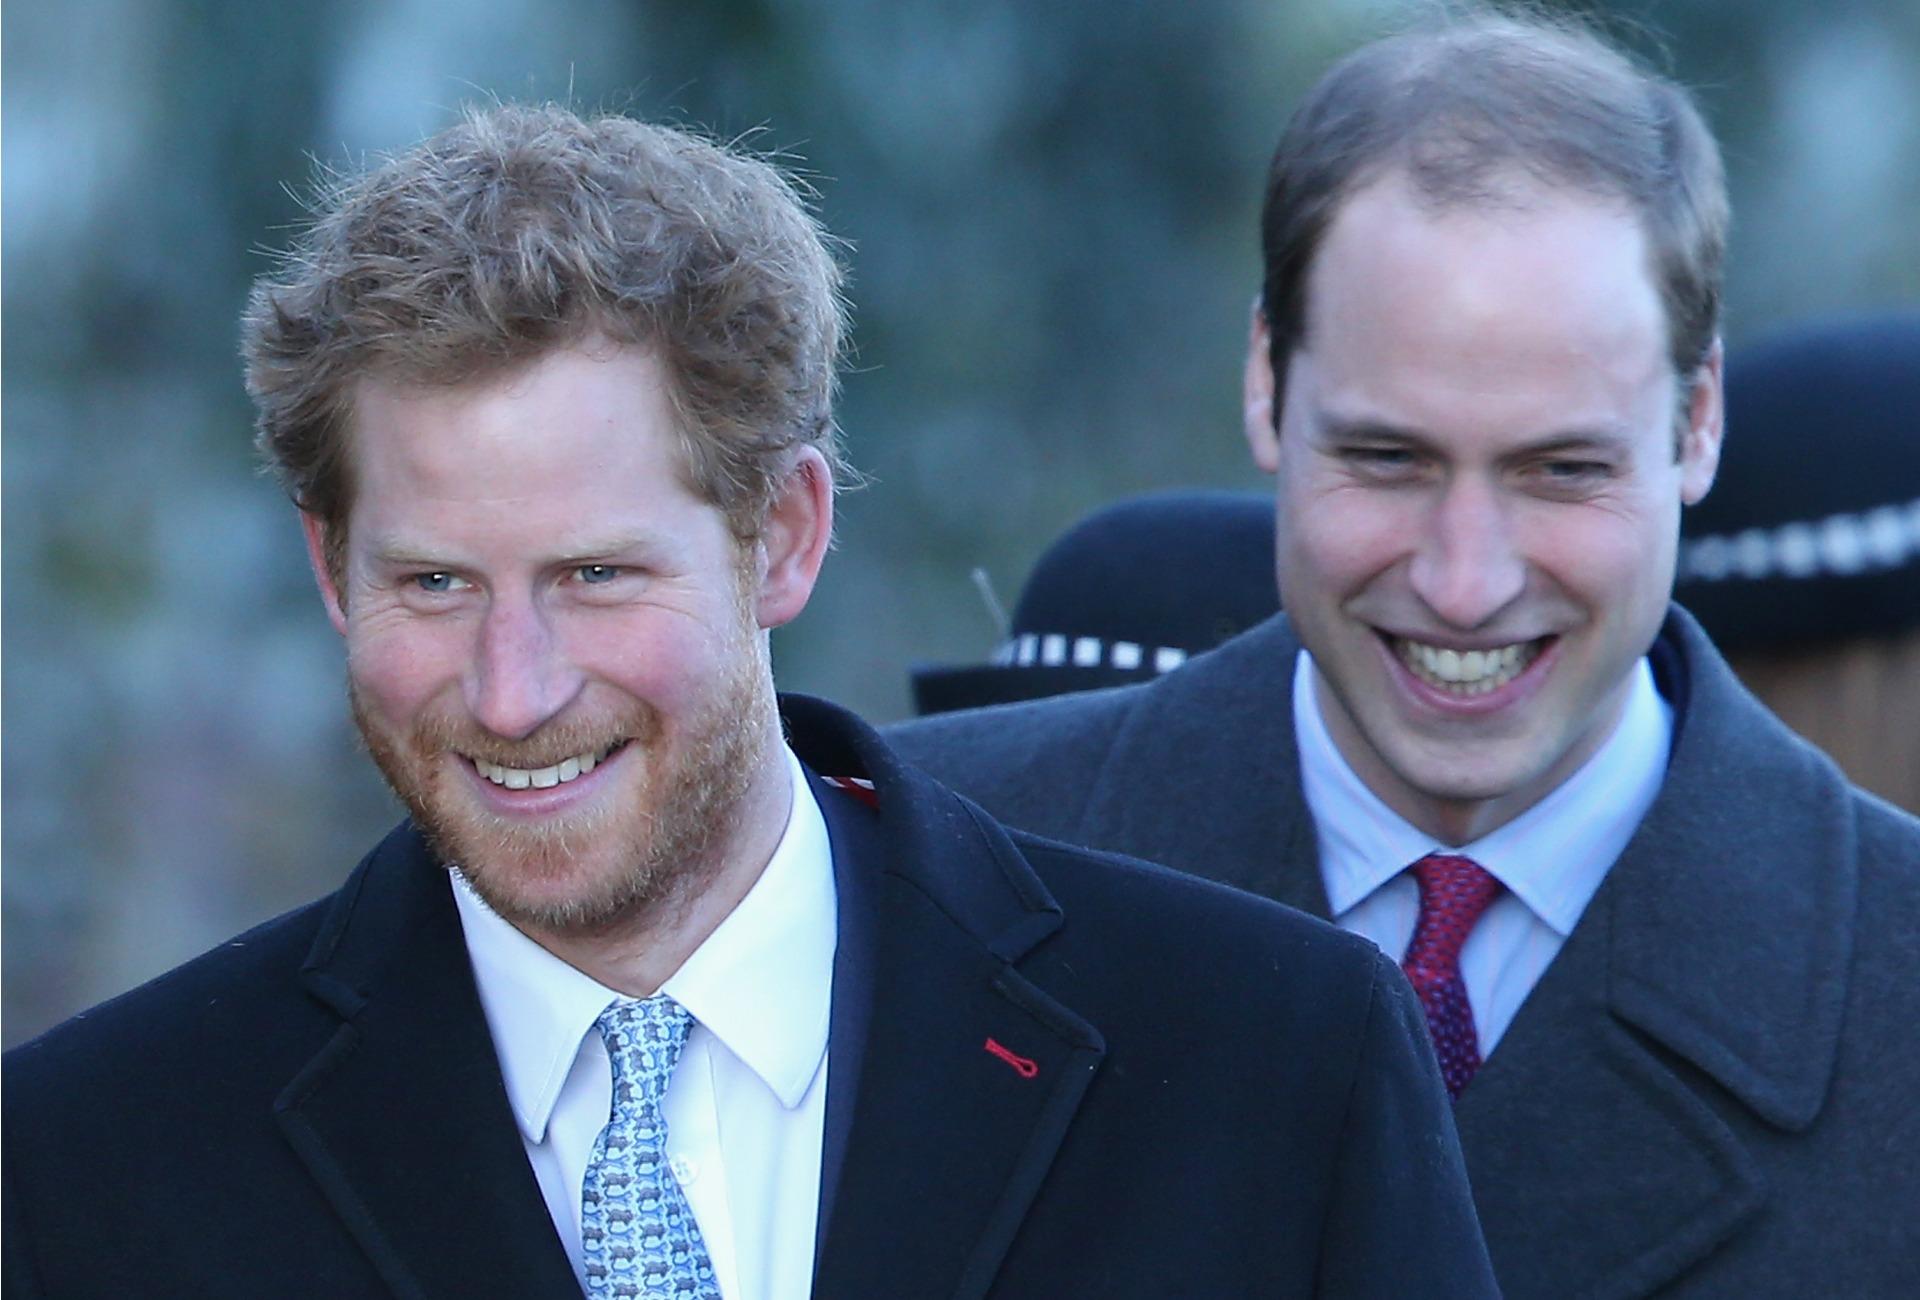 A nearly royal wedding